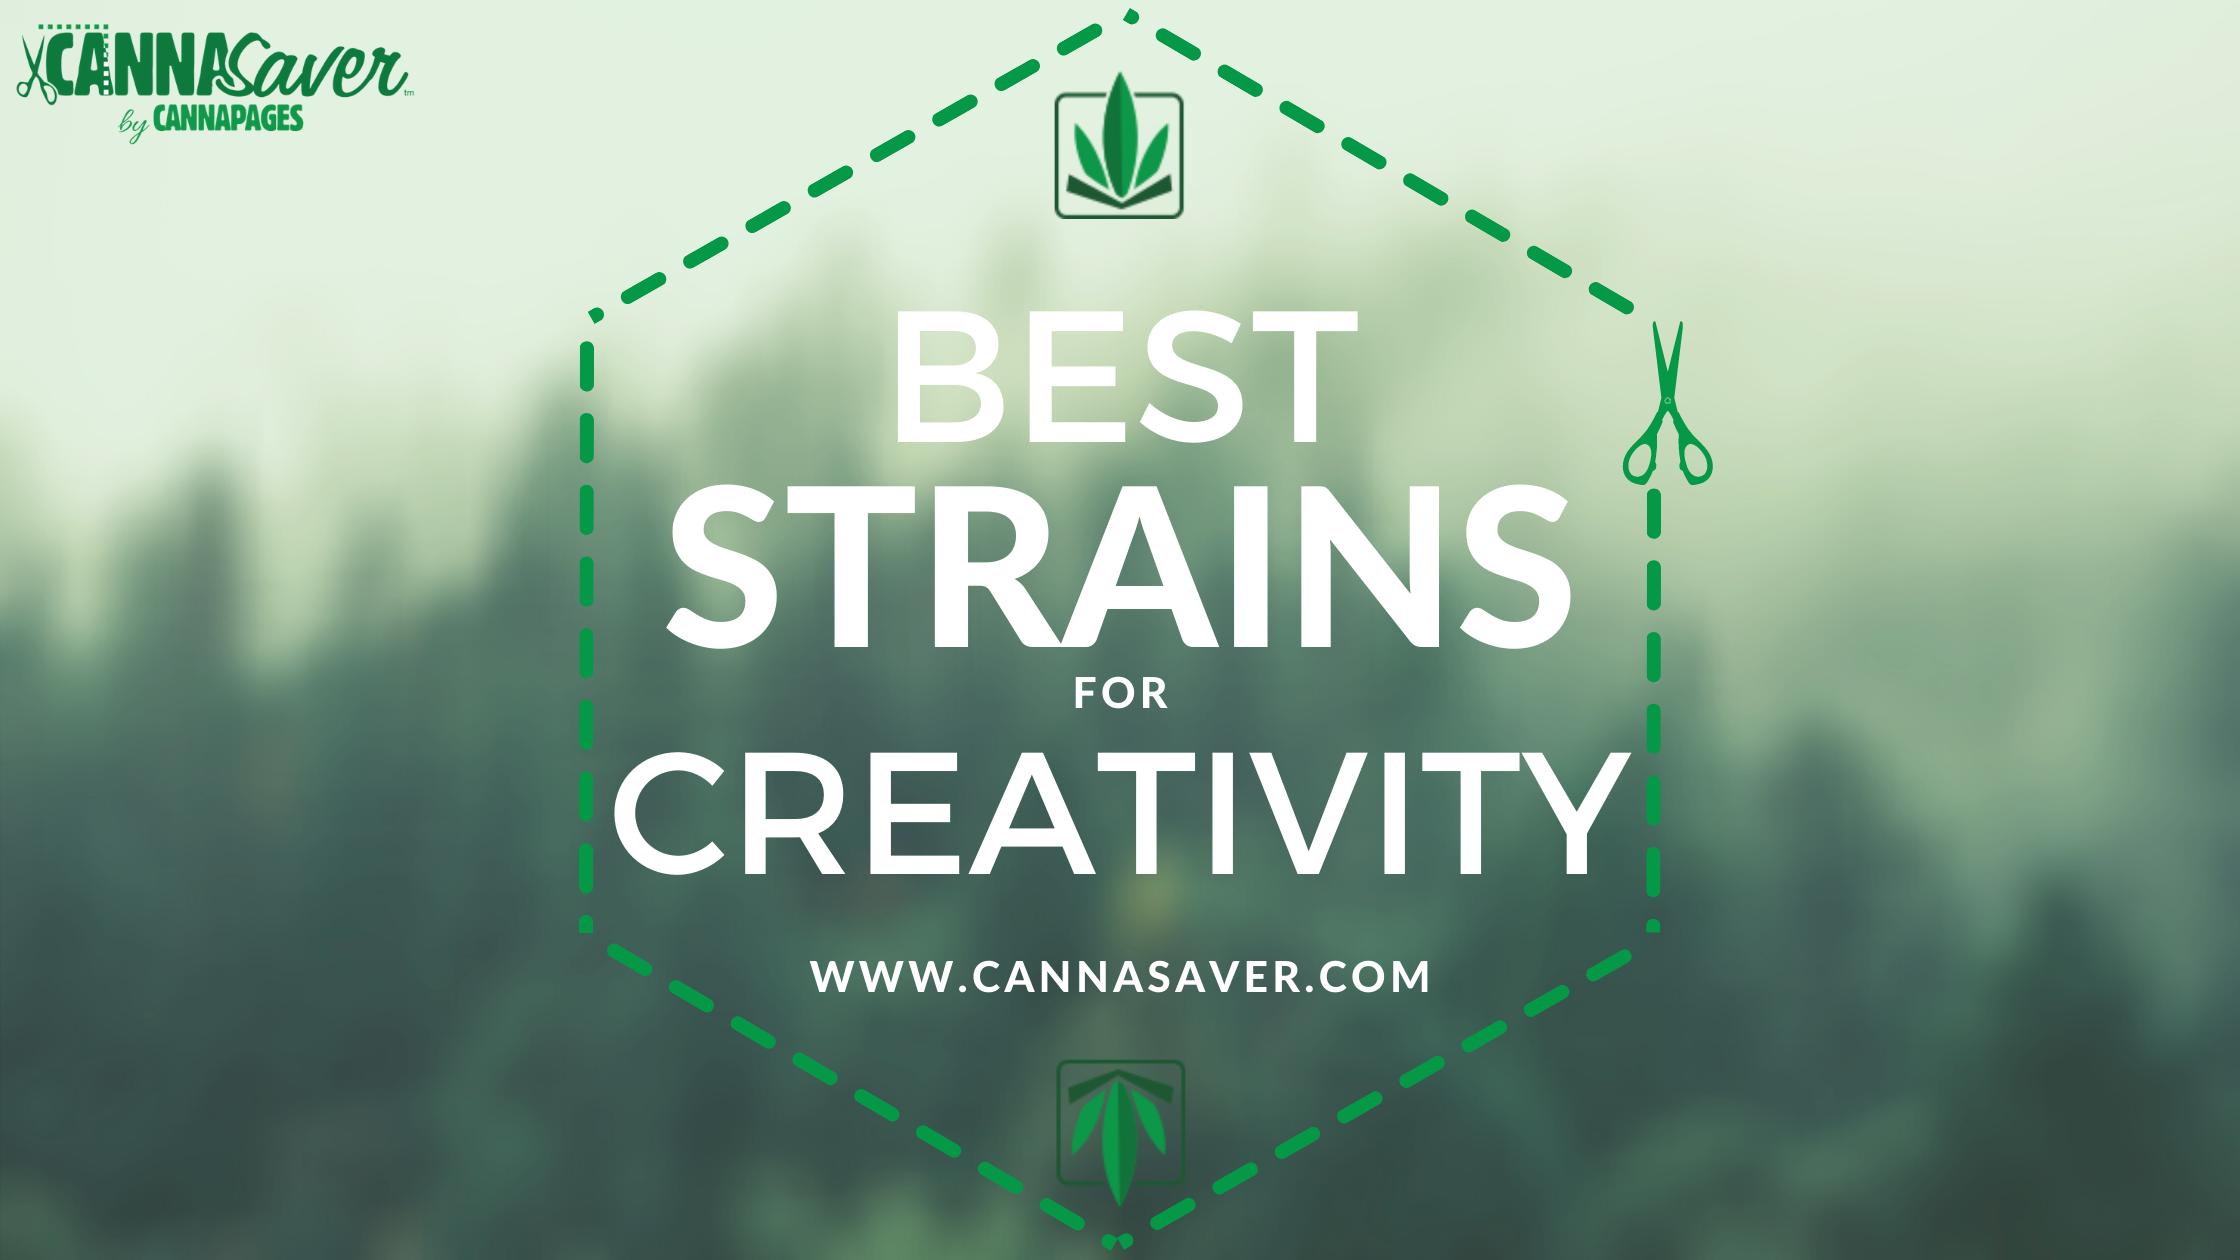 Best Strains For Creativity